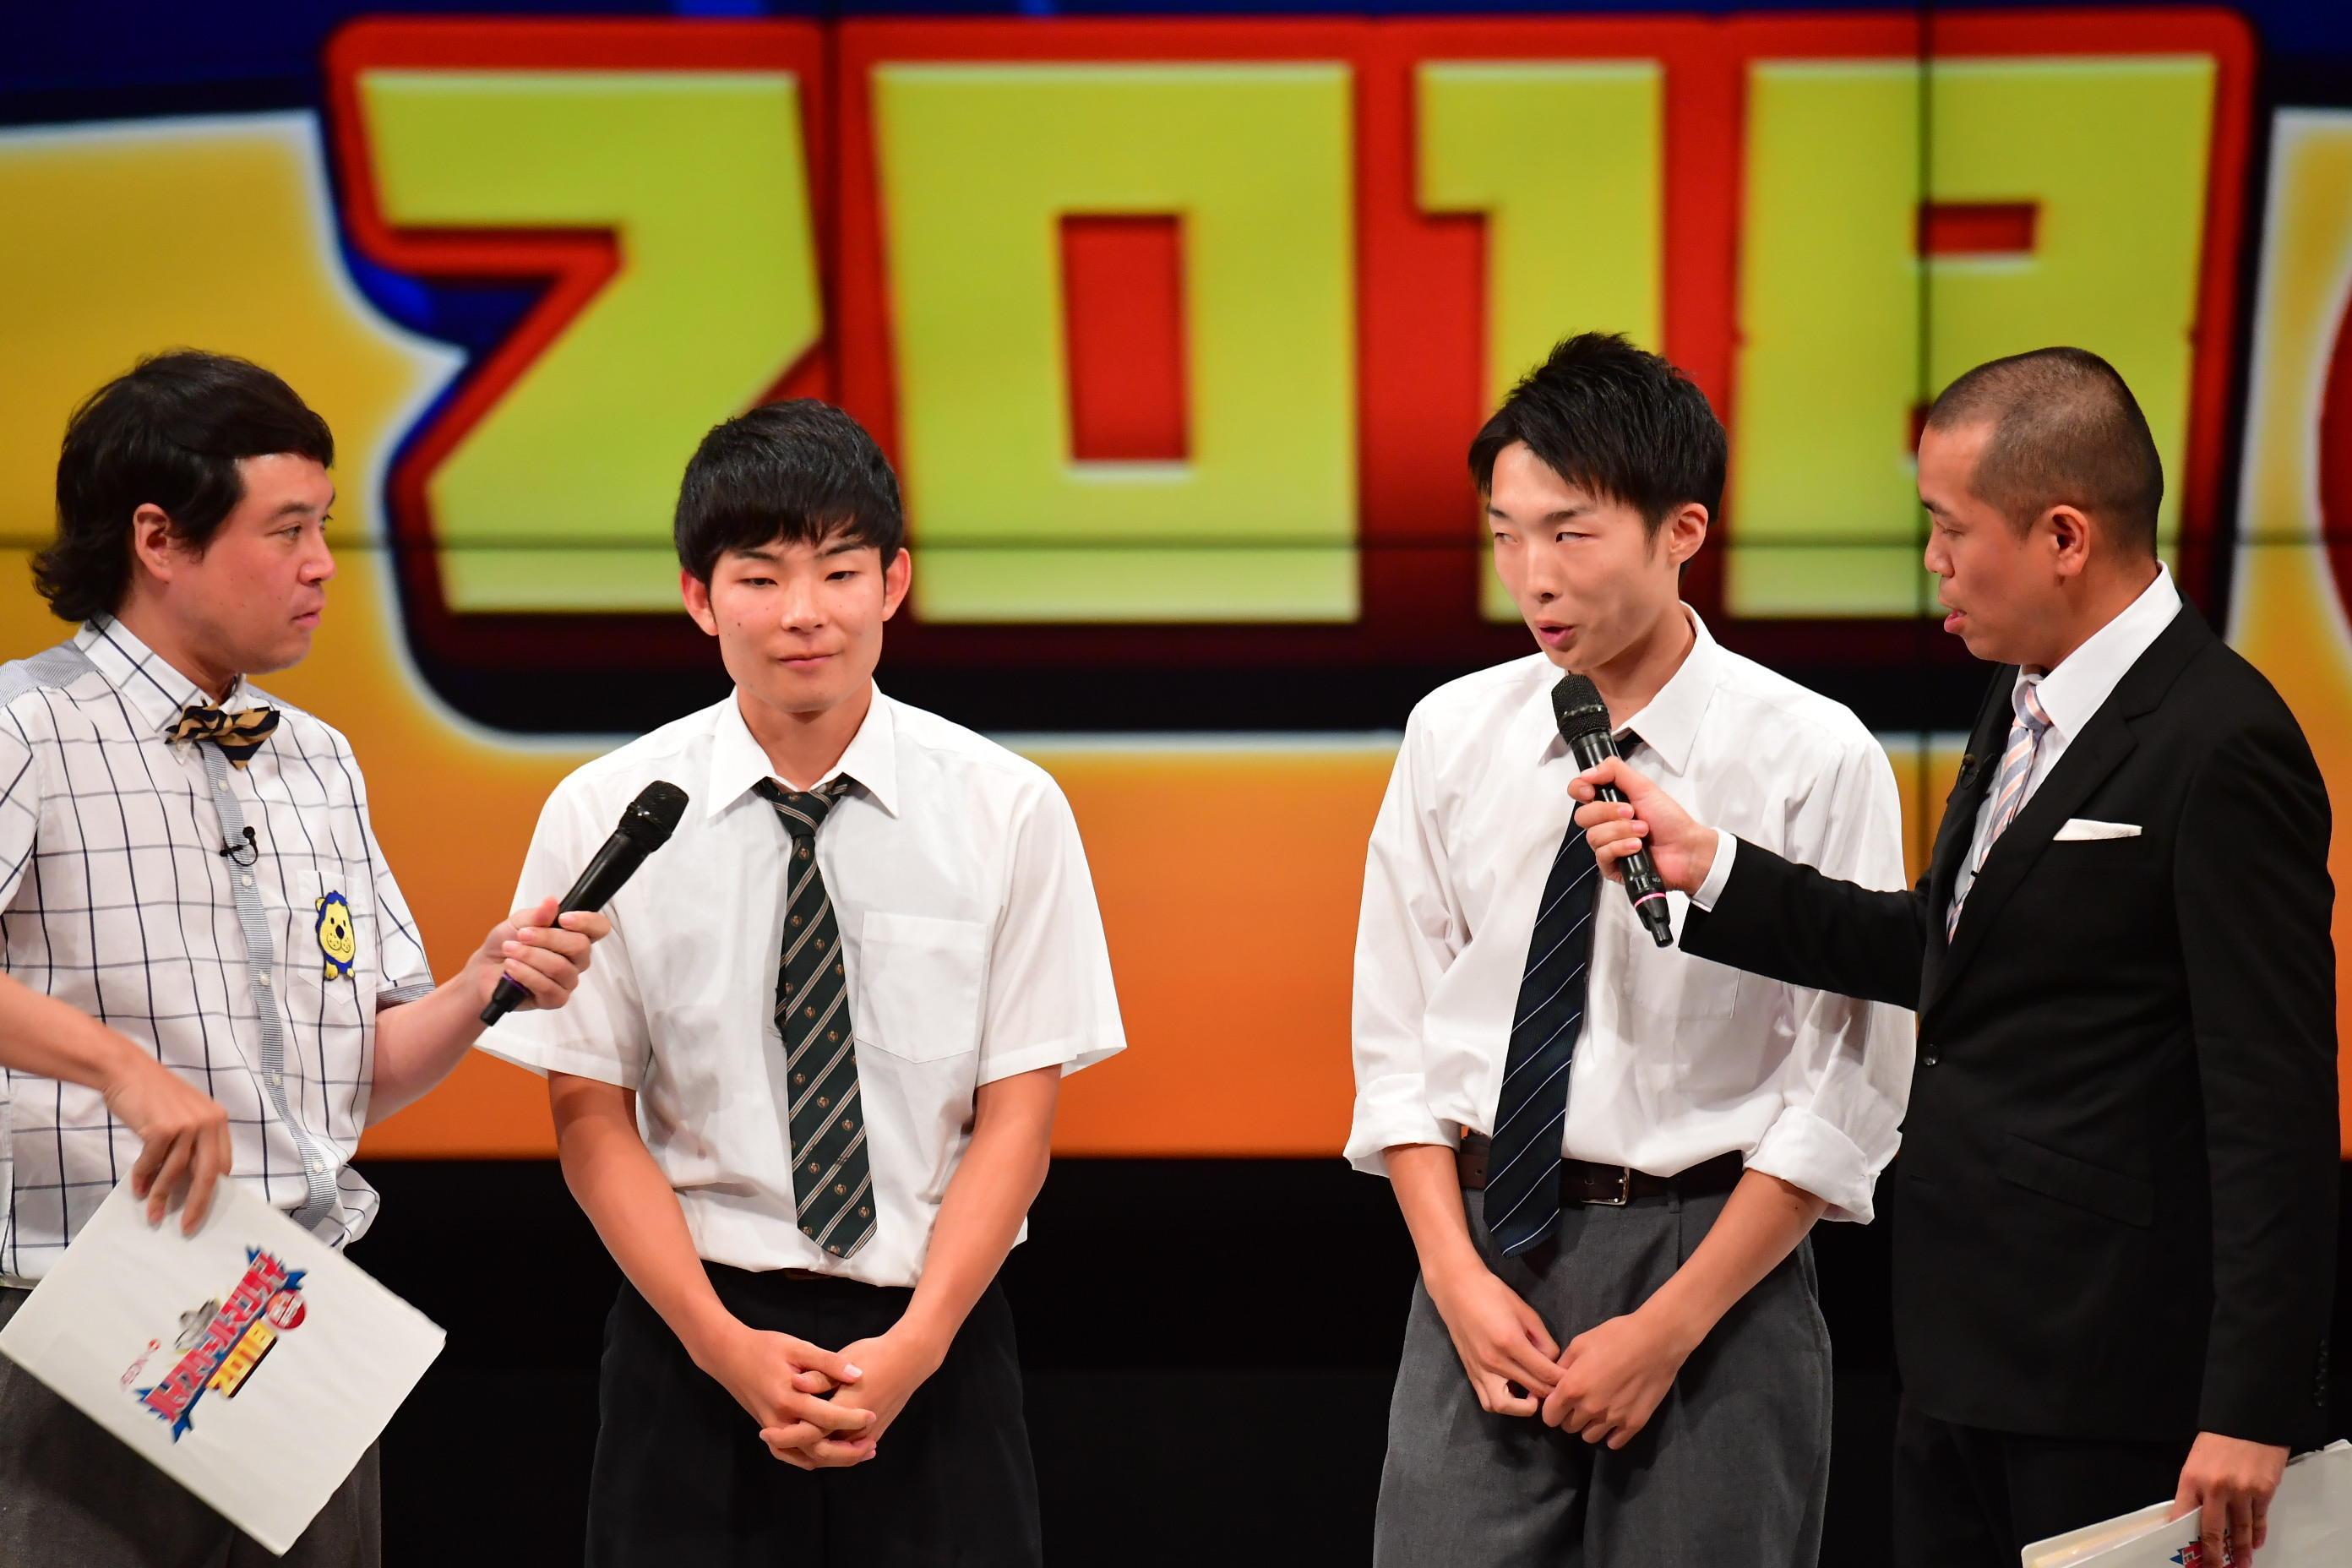 http://news.yoshimoto.co.jp/20180902231817-b1eef74c31ad4d0aa7091526ec4fcf9c2e4fe55d.jpg